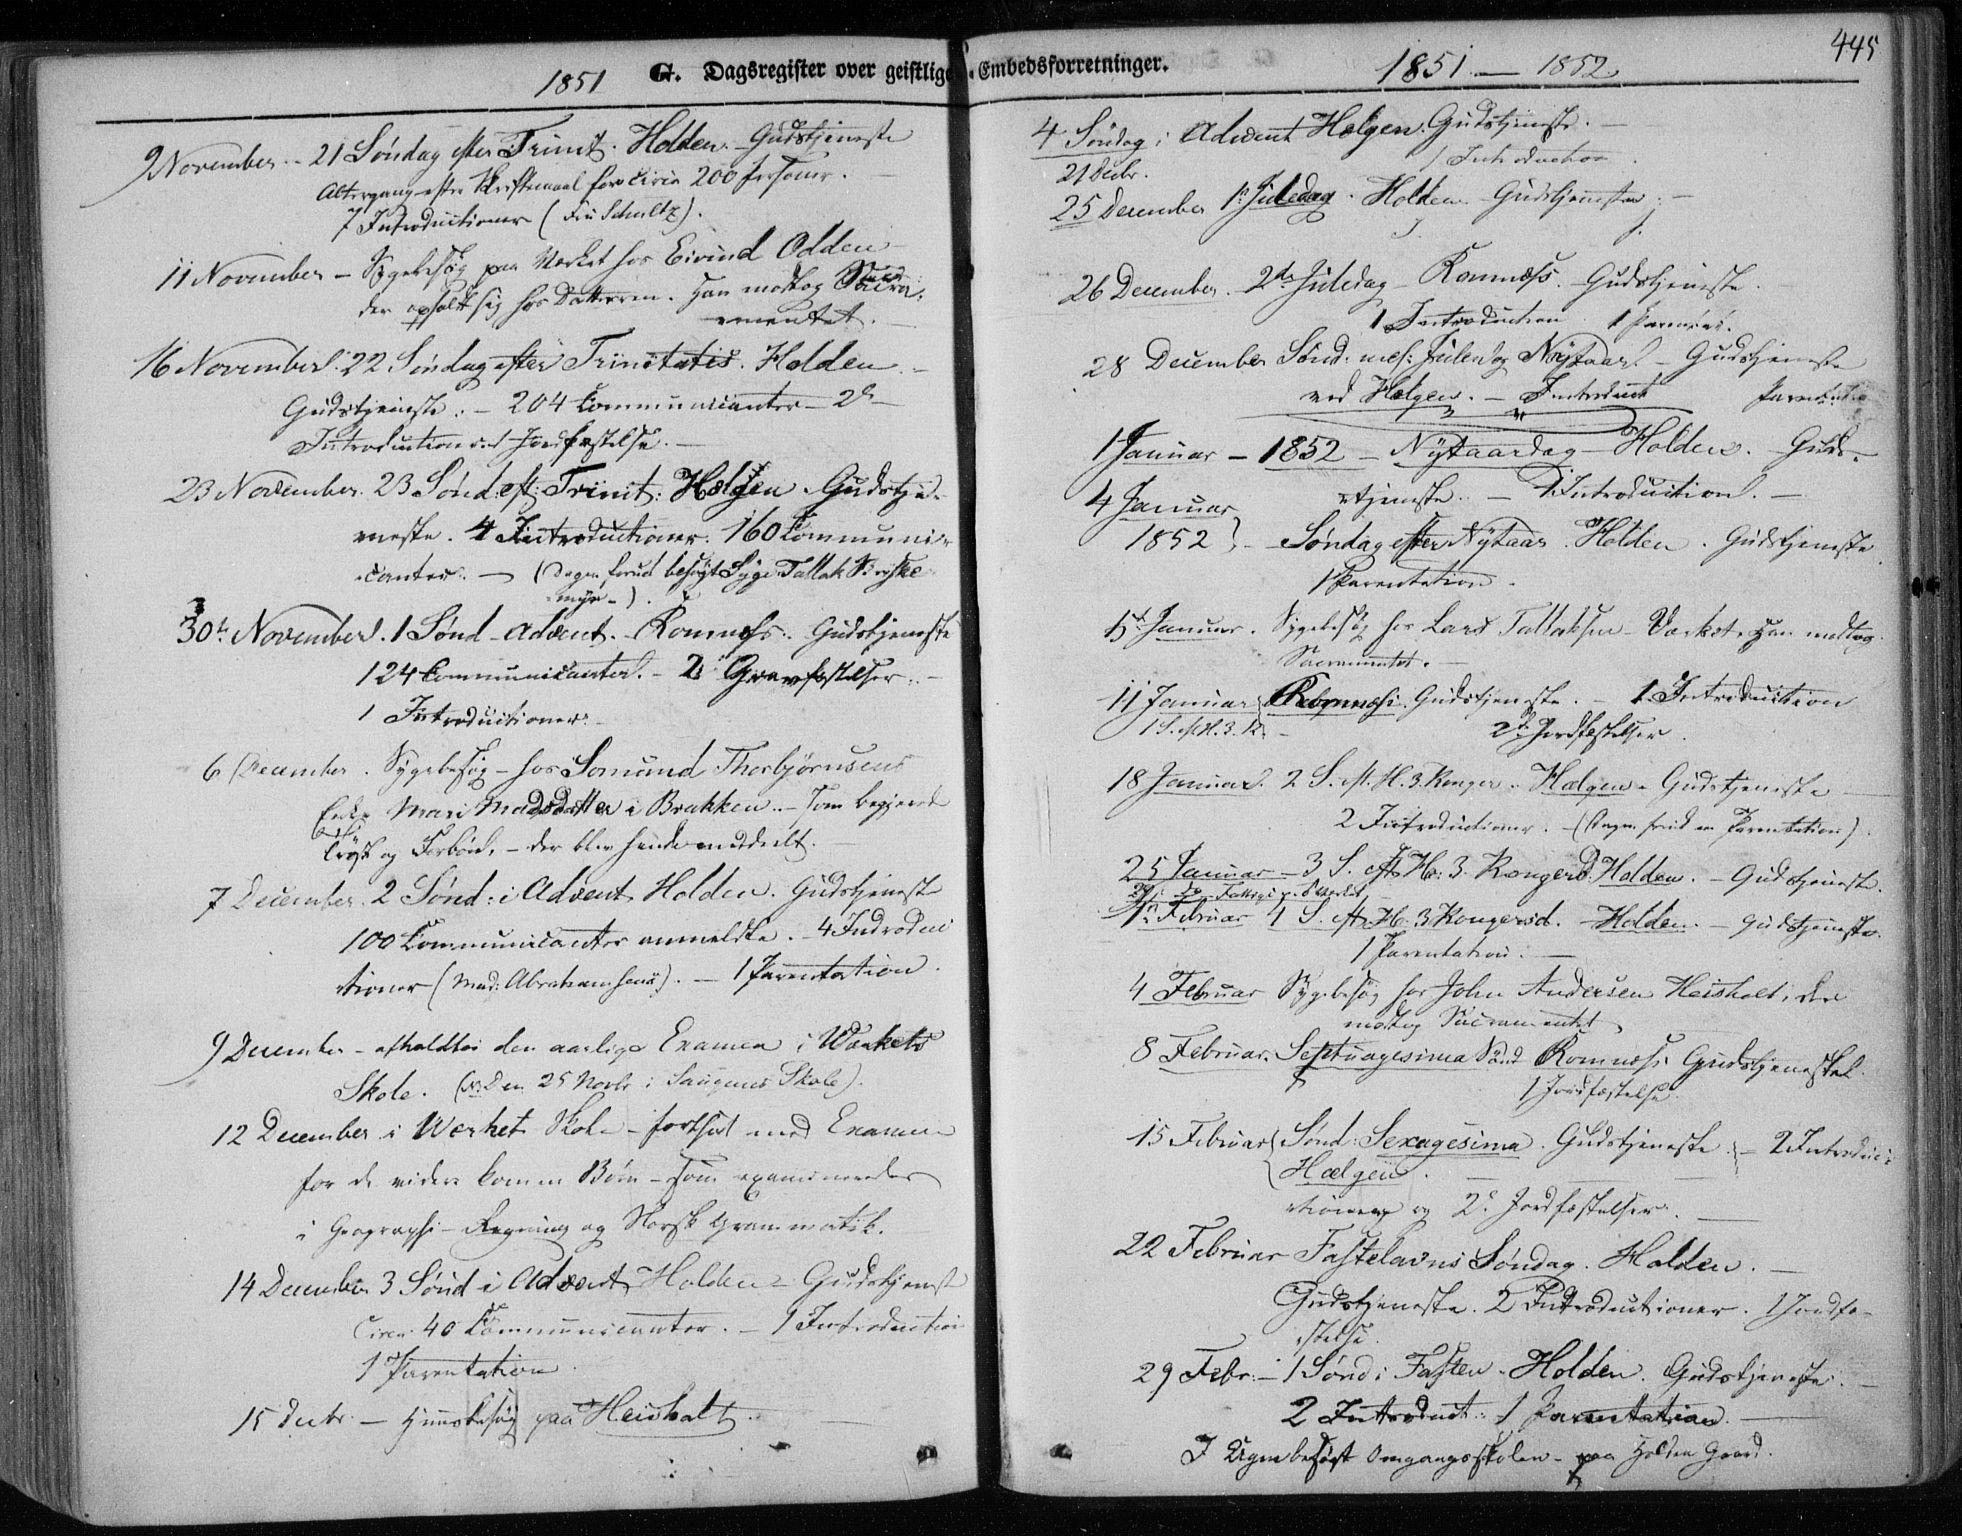 SAKO, Holla kirkebøker, F/Fa/L0005: Ministerialbok nr. 5, 1849-1860, s. 445